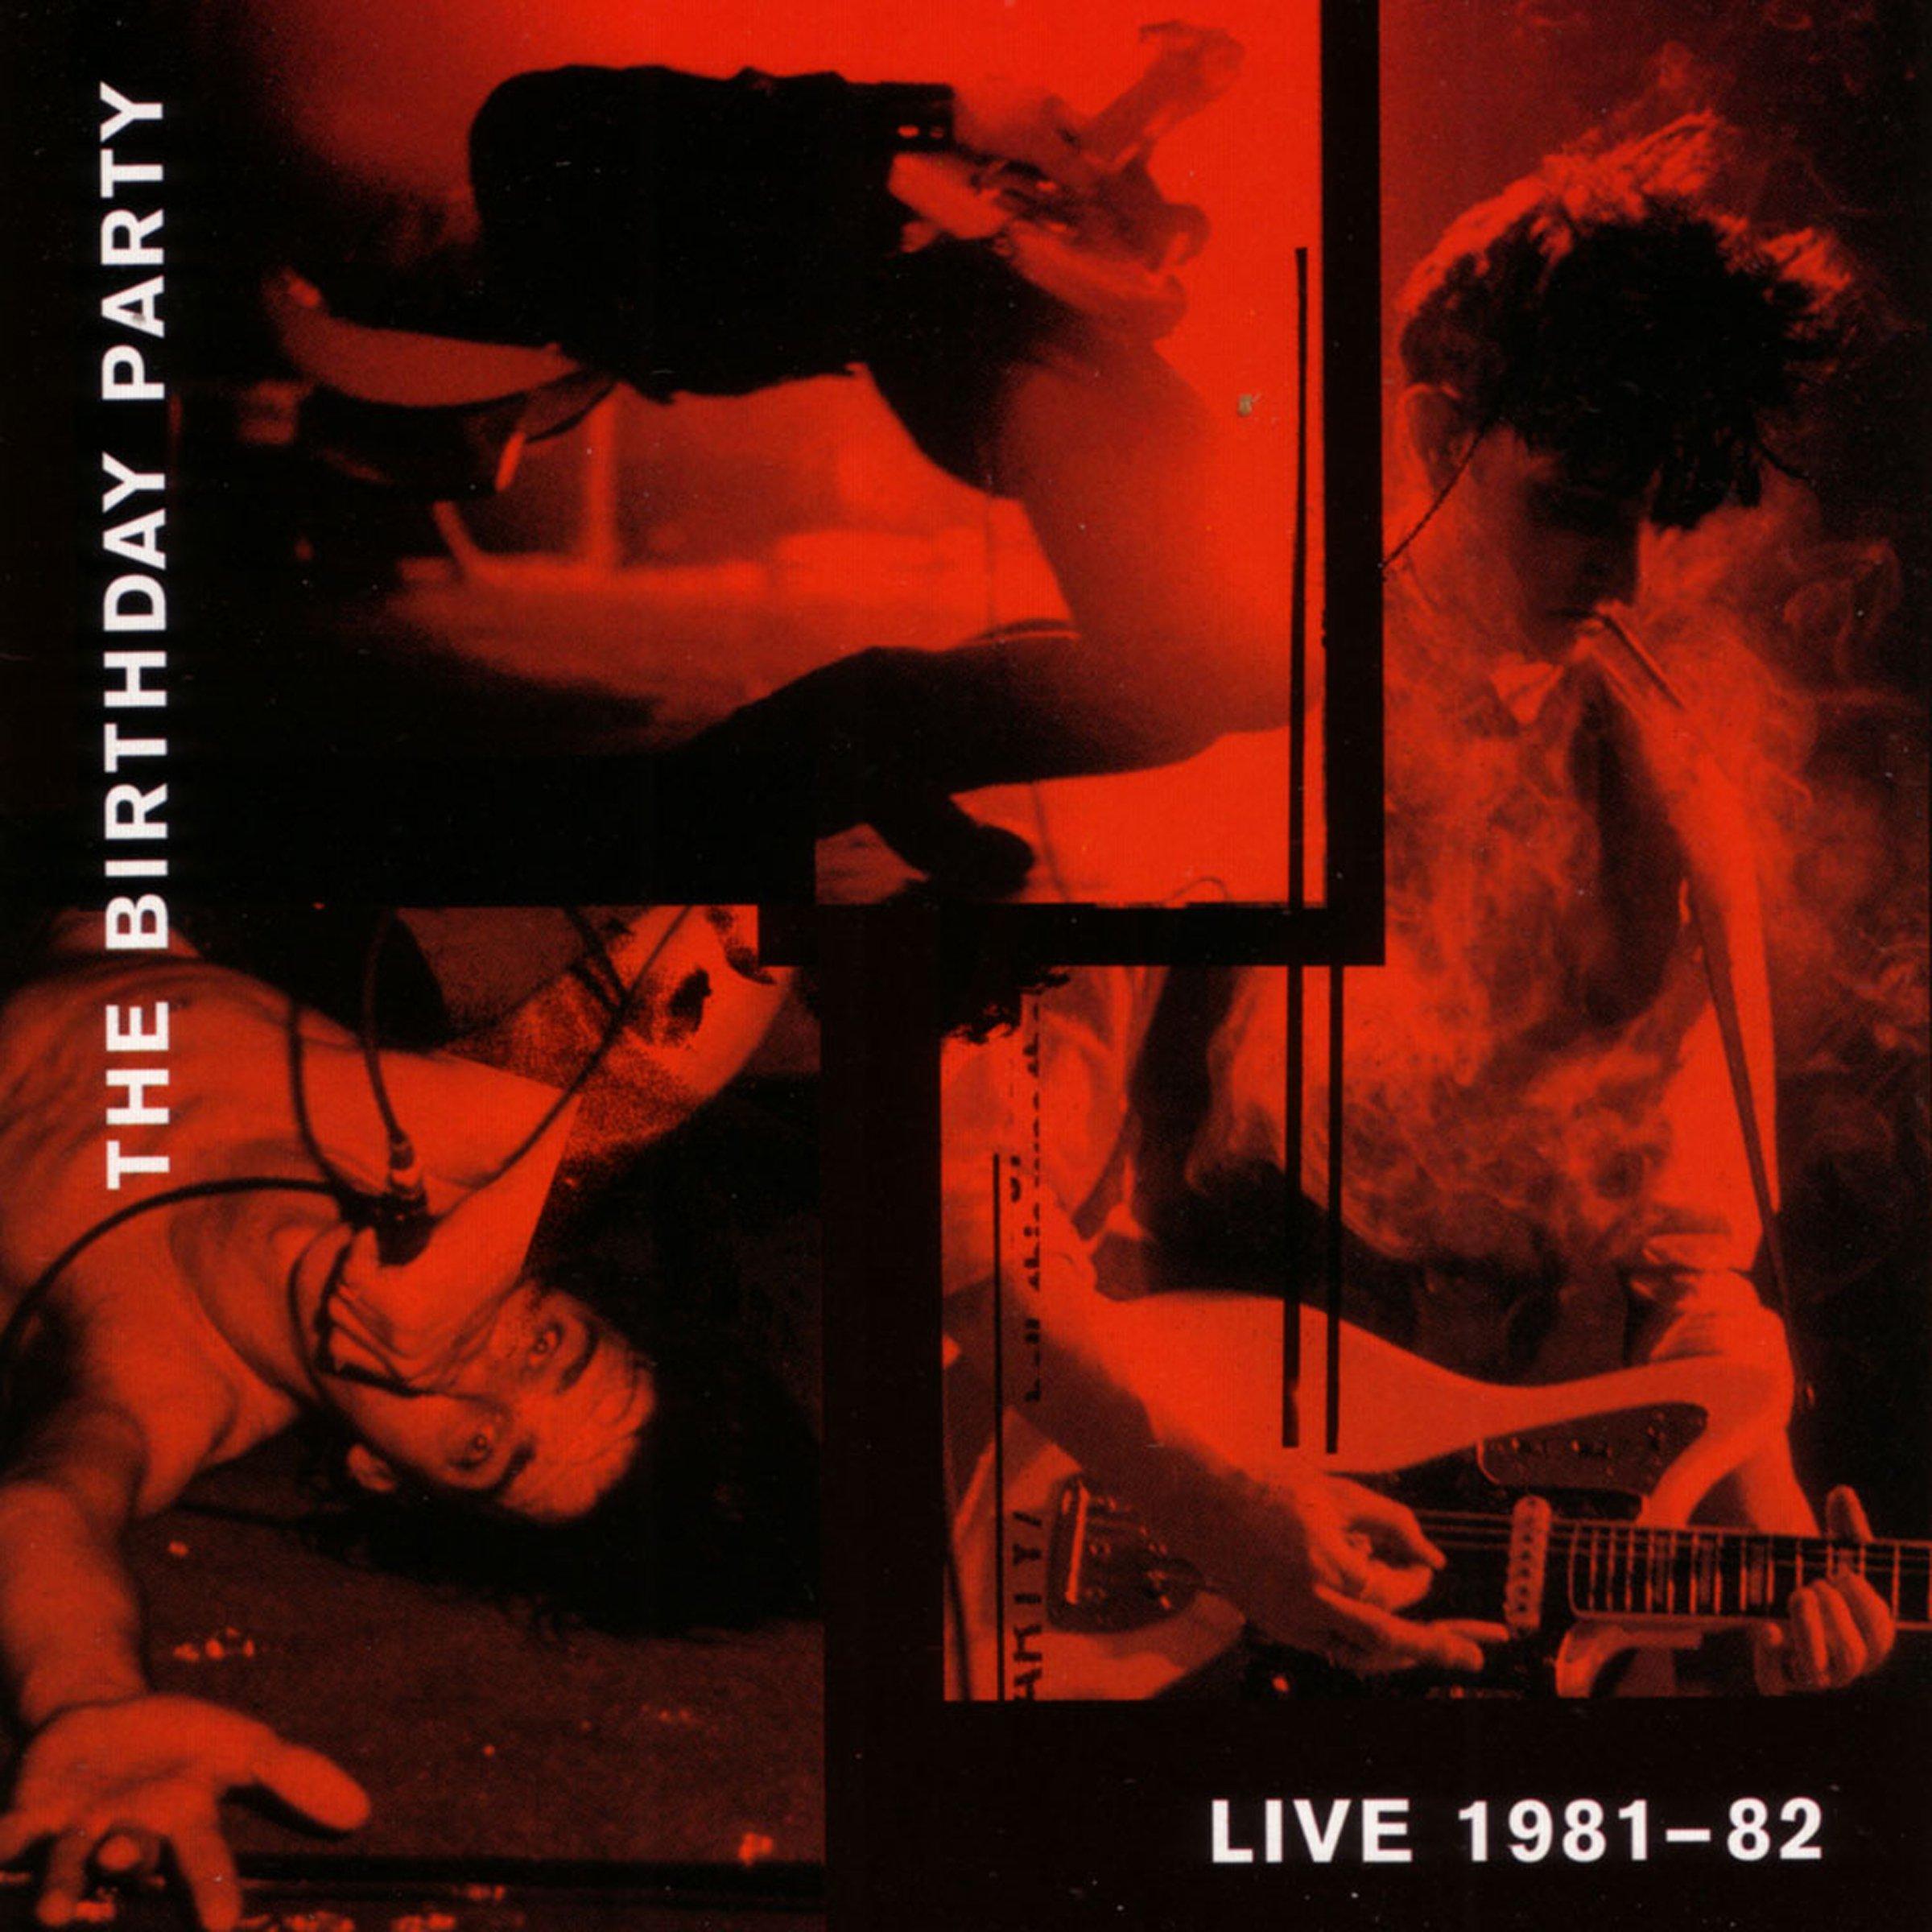 Vinilo : The Birthday Party - Live 81-82 (Bonus CD, 3 Disc)